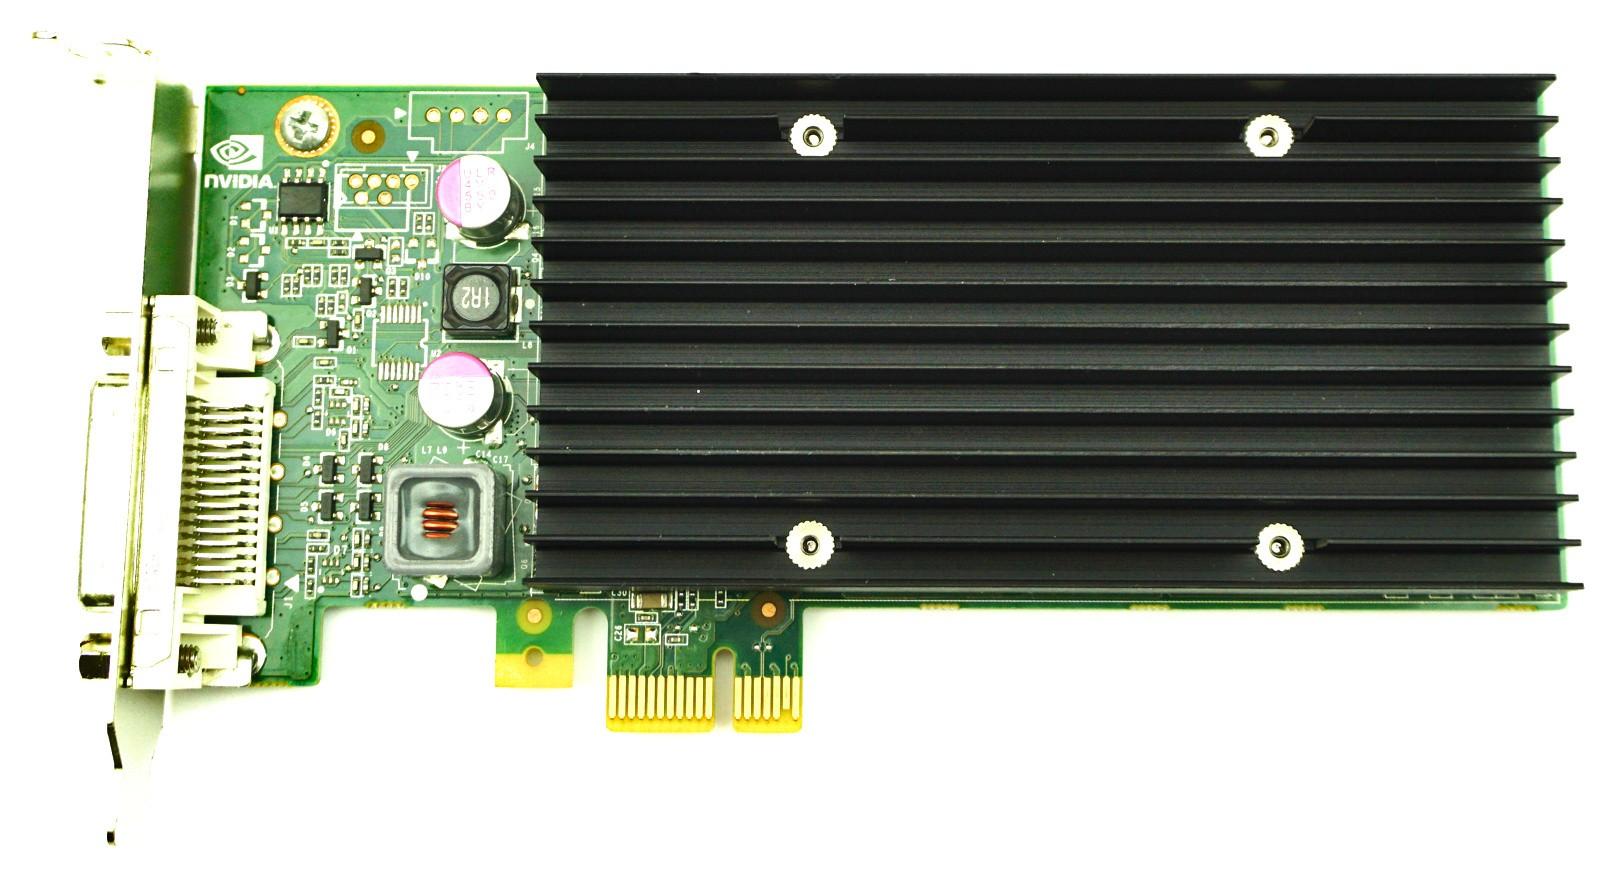 DELL PRECISION T3600 NVIDIA NVS300 GRAPHICS DRIVERS WINDOWS XP